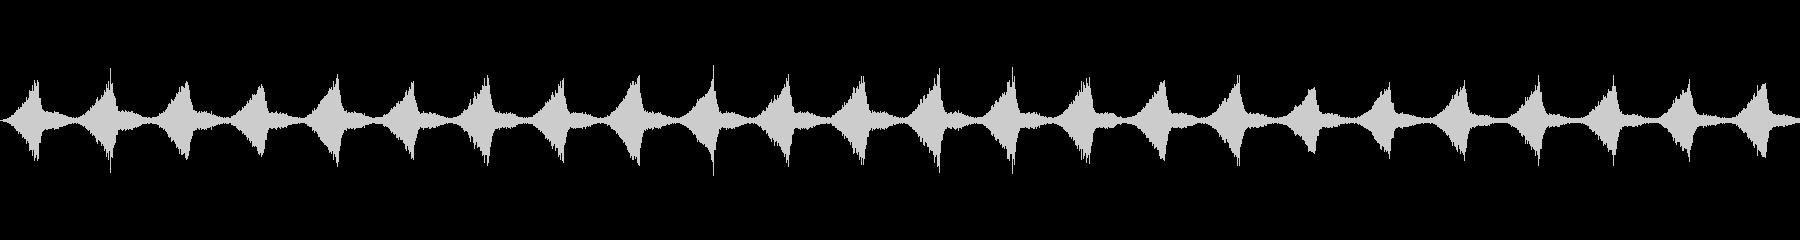 ファンファンファンファンの未再生の波形